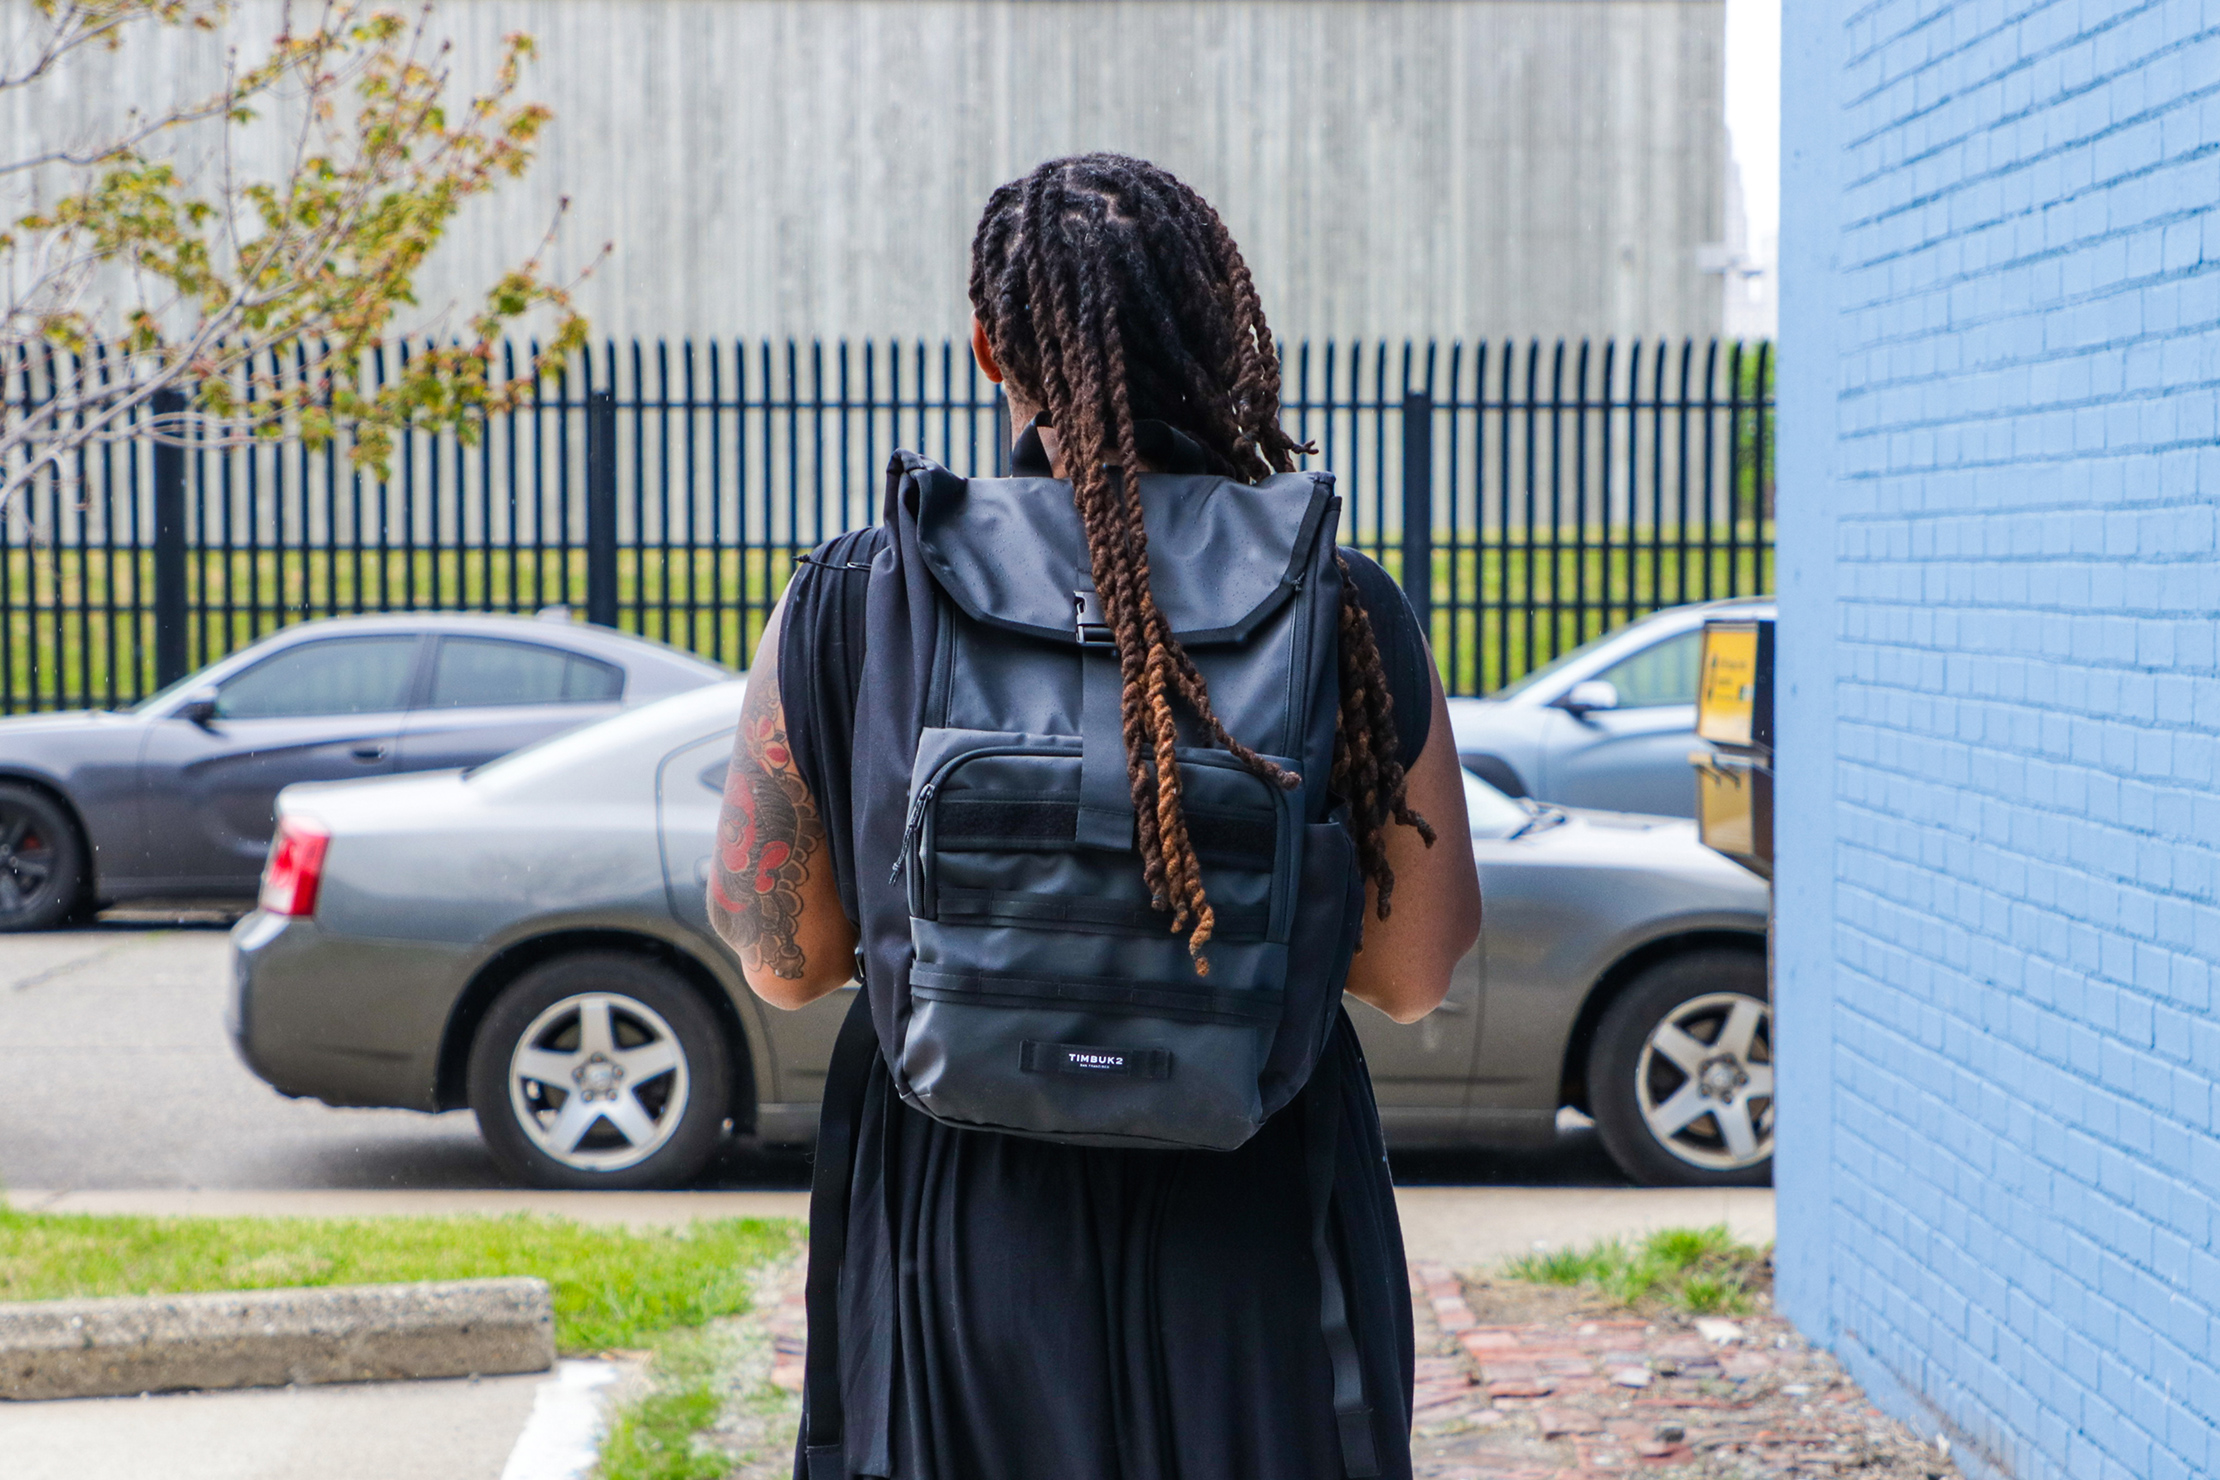 Timbuk2 Spire Laptop Backpack 2.0 in Detroit